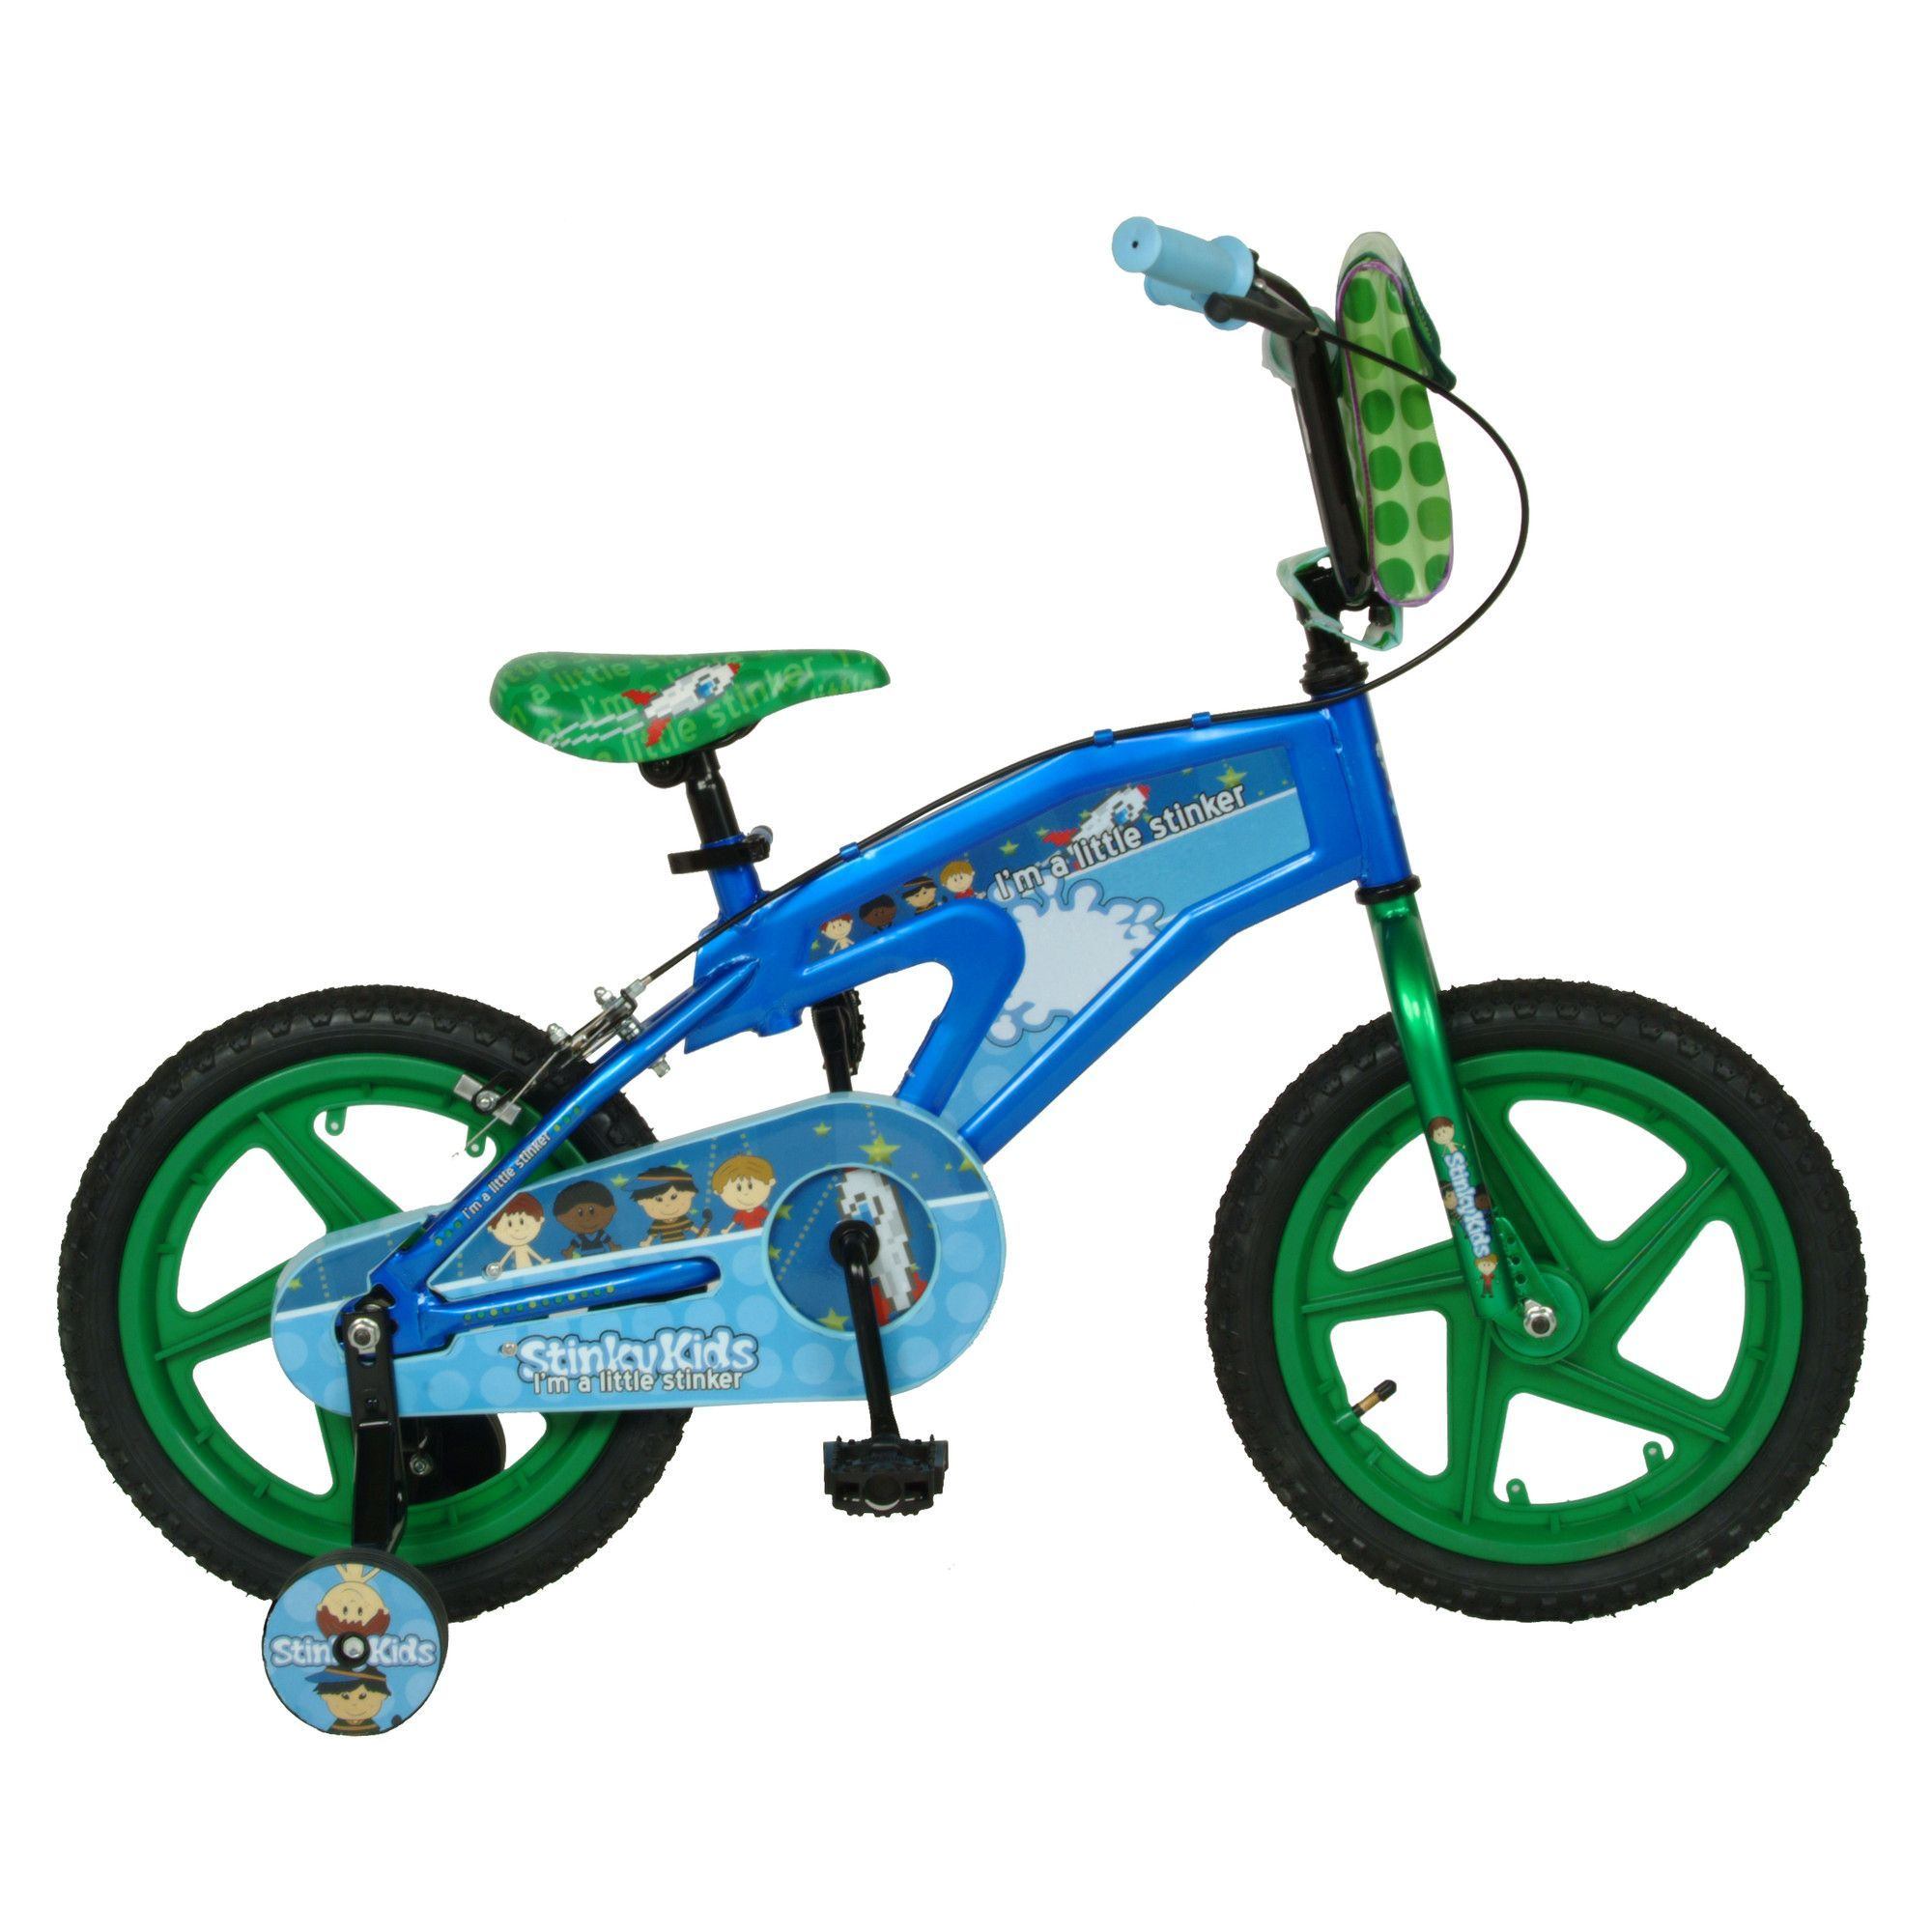 "Boy's 16"" Road Bike"